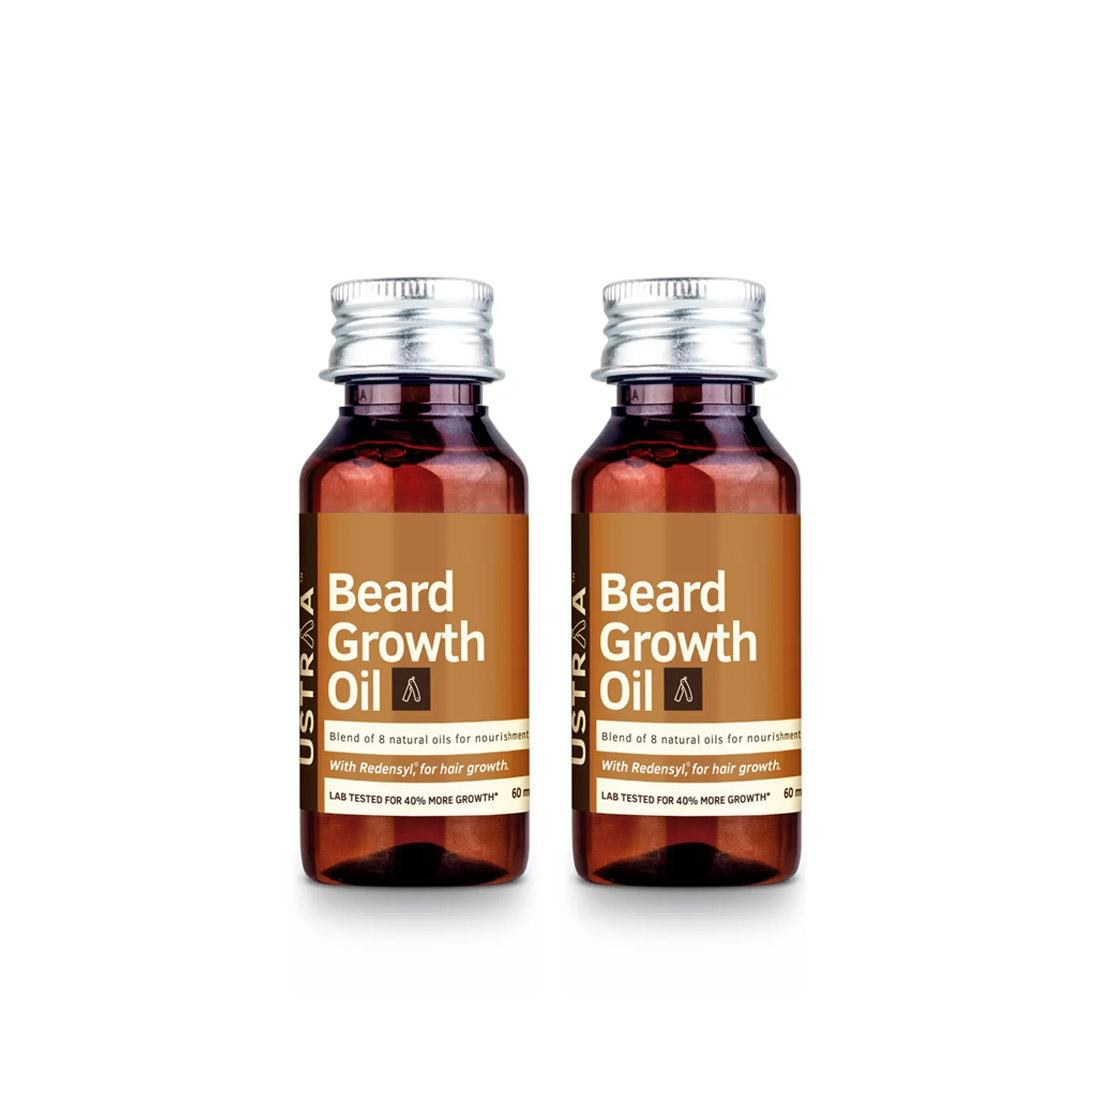 Beard Growth Oil 60ml- Set of 2